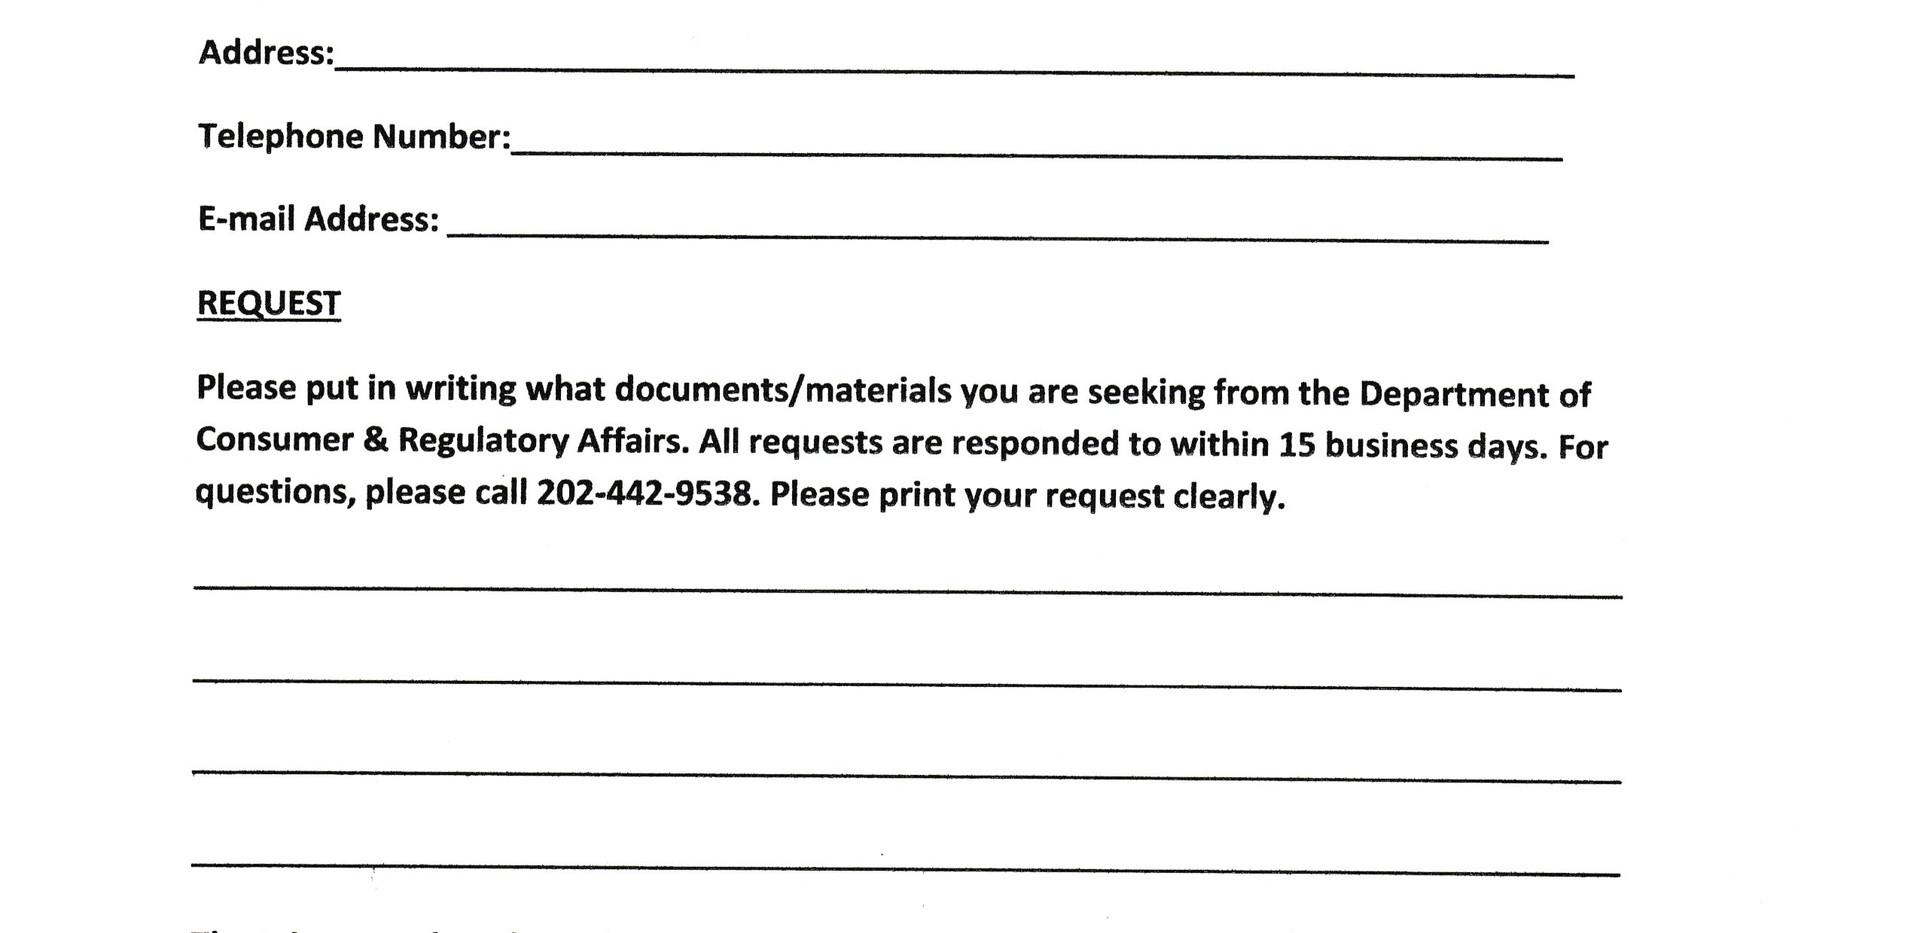 DCRA FOIA Request Forms 002.jpg